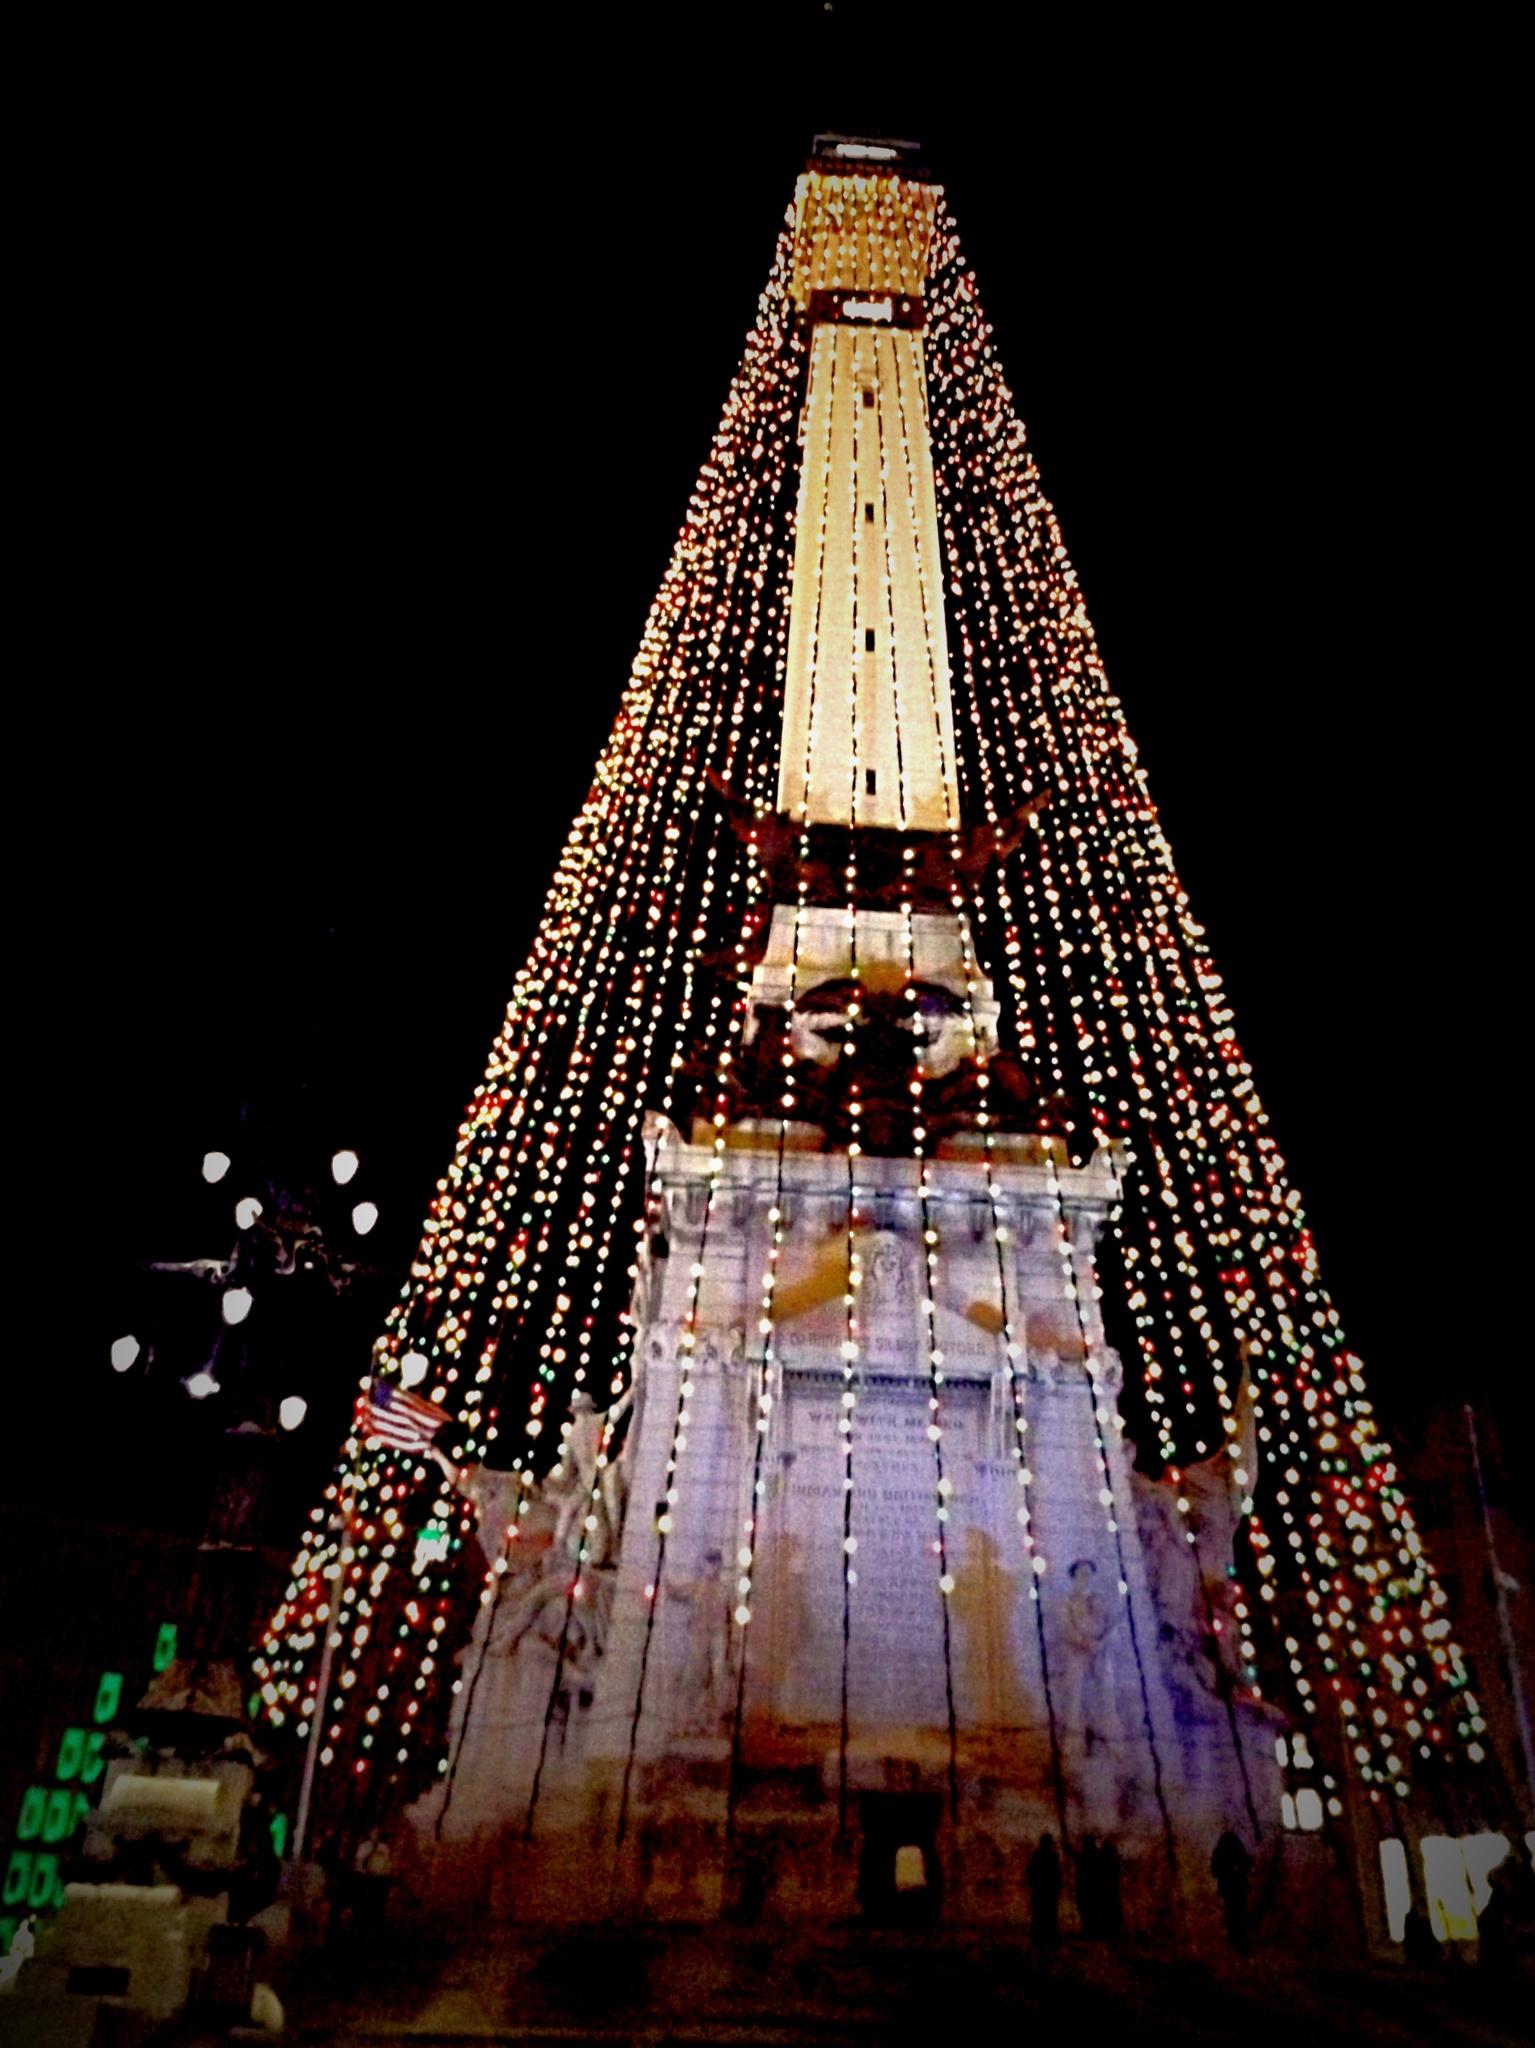 World's Tallest Christmas Tree by Tammy Warner Hood